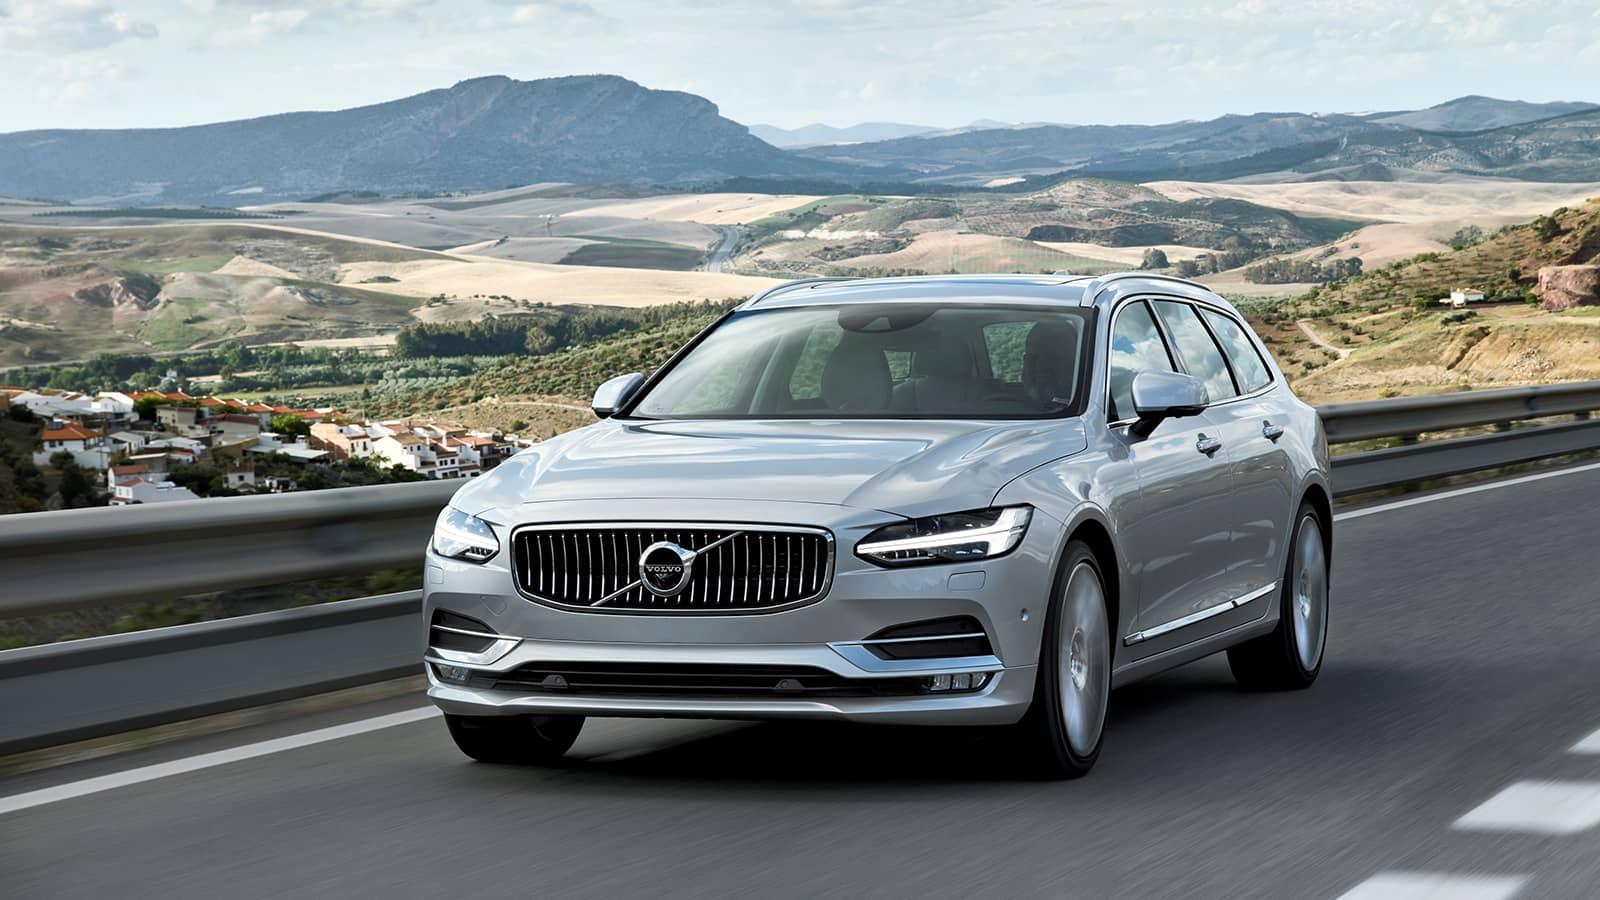 2020 Volvo V90 Images